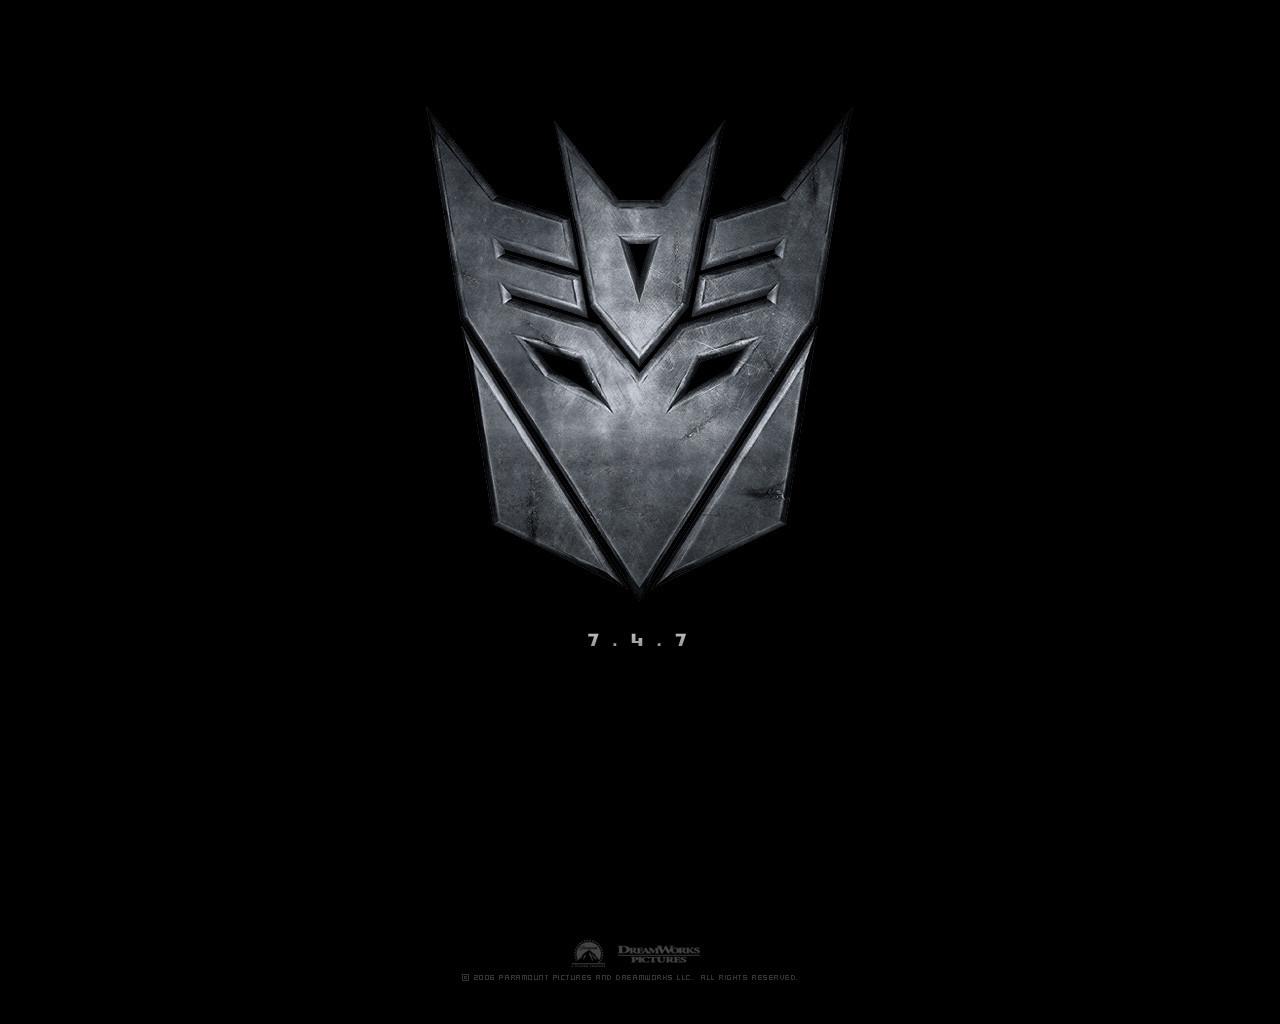 wallpaper logo transformers shia labeouf 2007 darkness